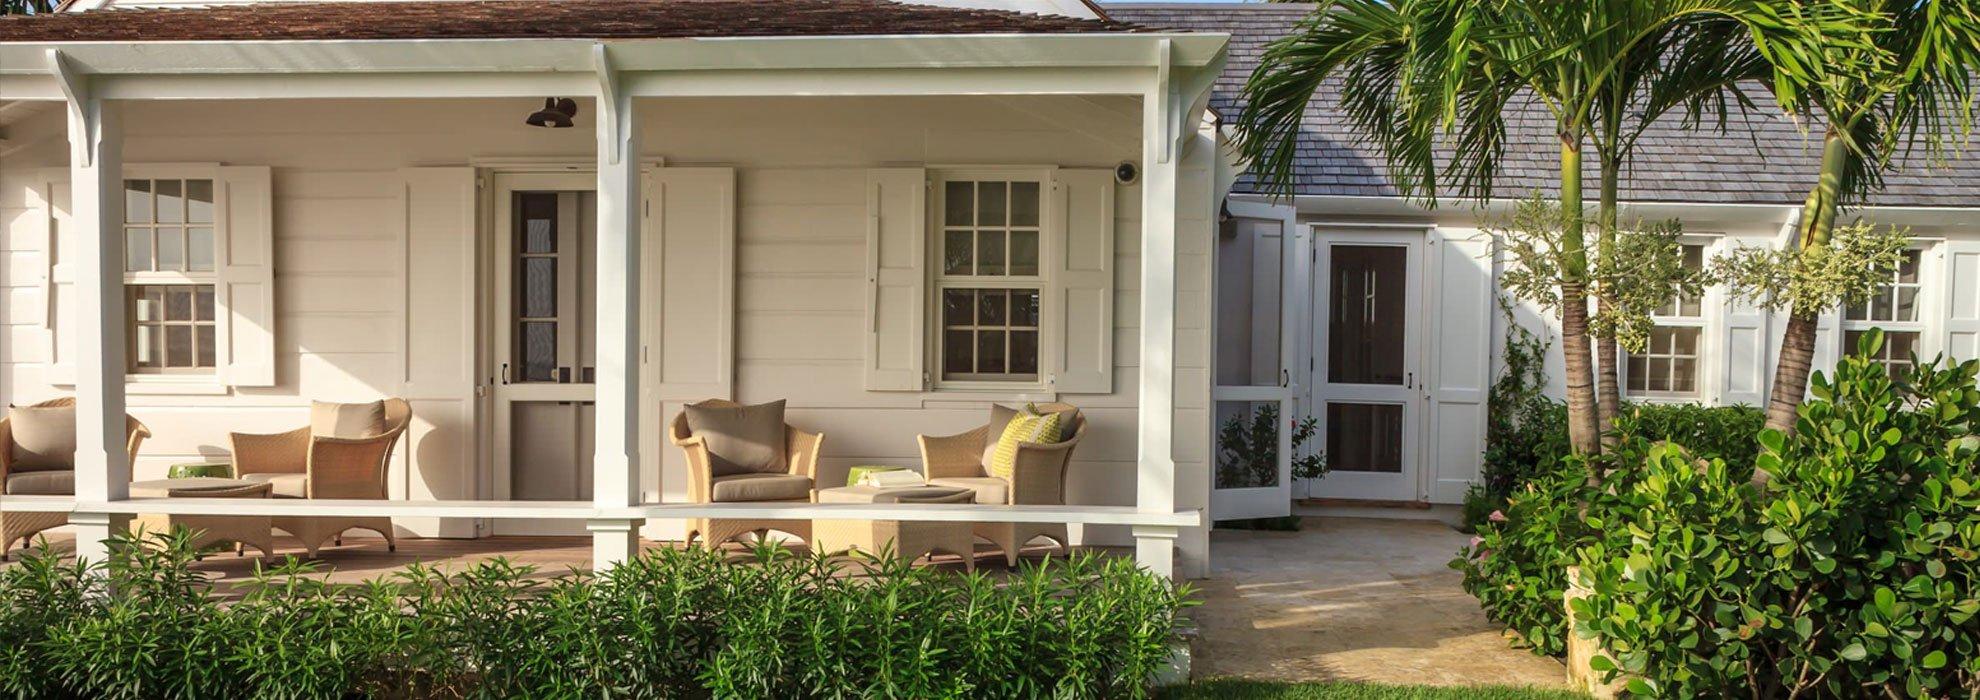 Porch in Charleston, South Carolina